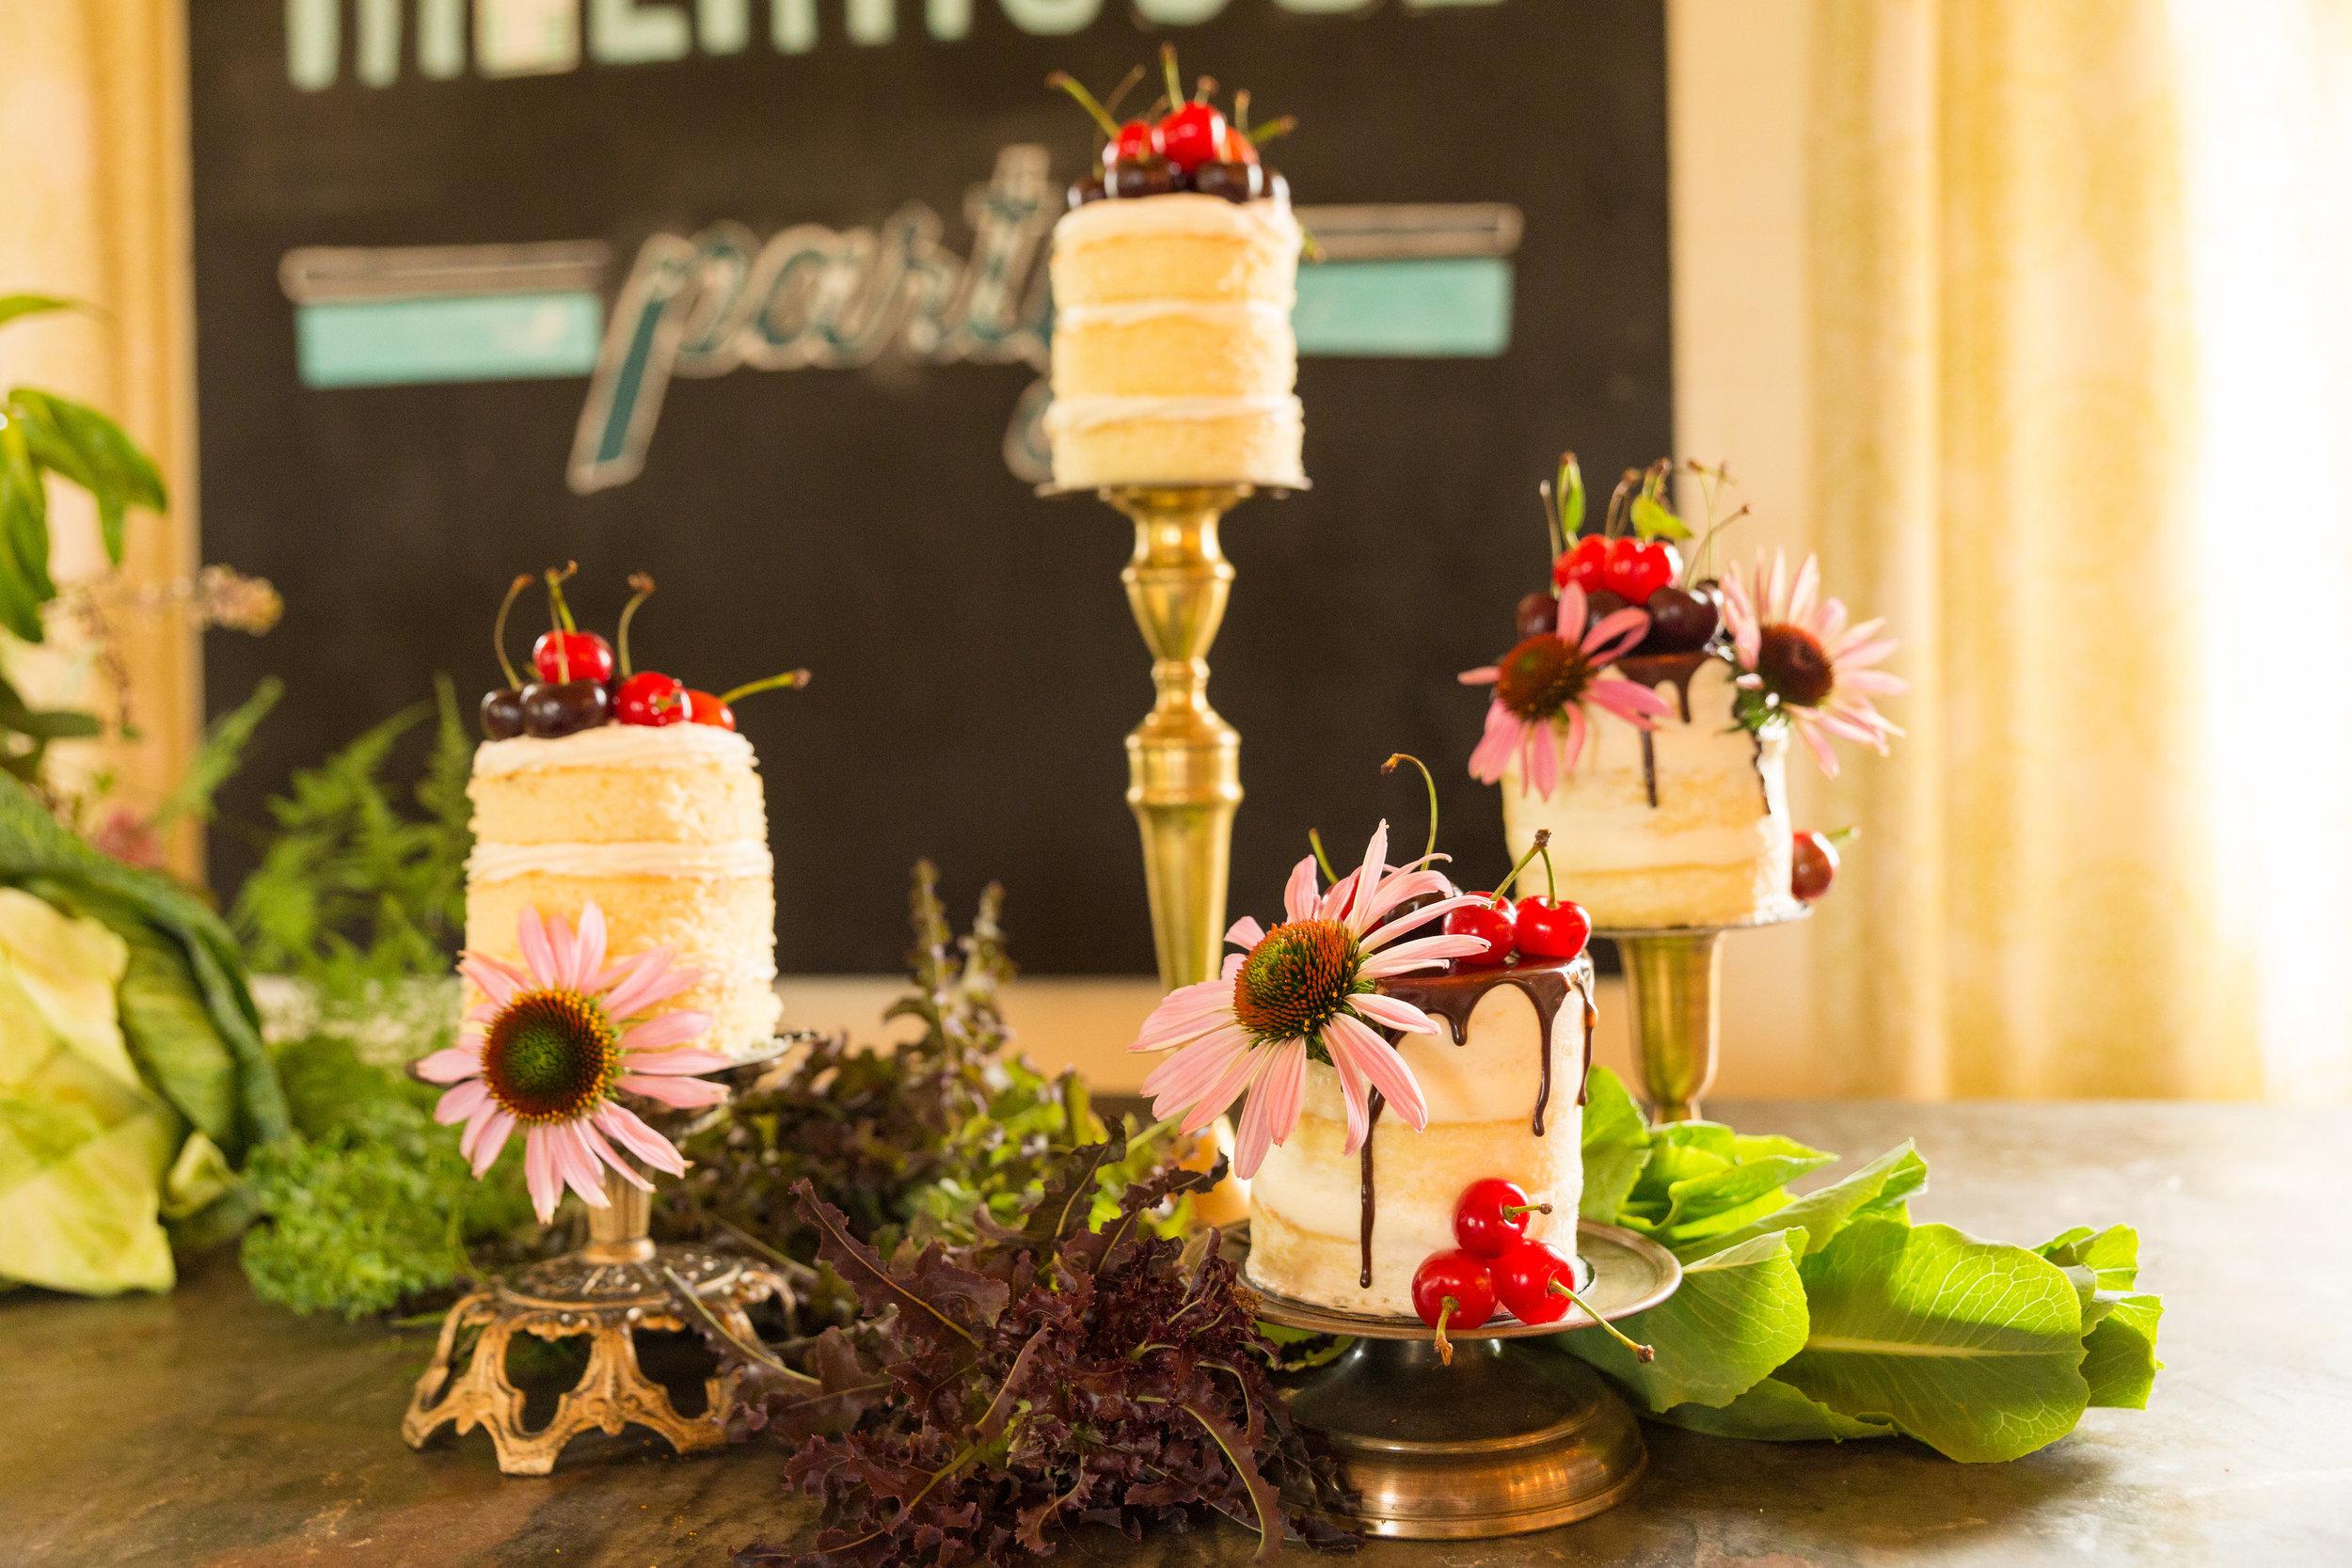 Danielle-Jeff-Farm-to-table-wedding-photography-love-story-studios-0049.jpg